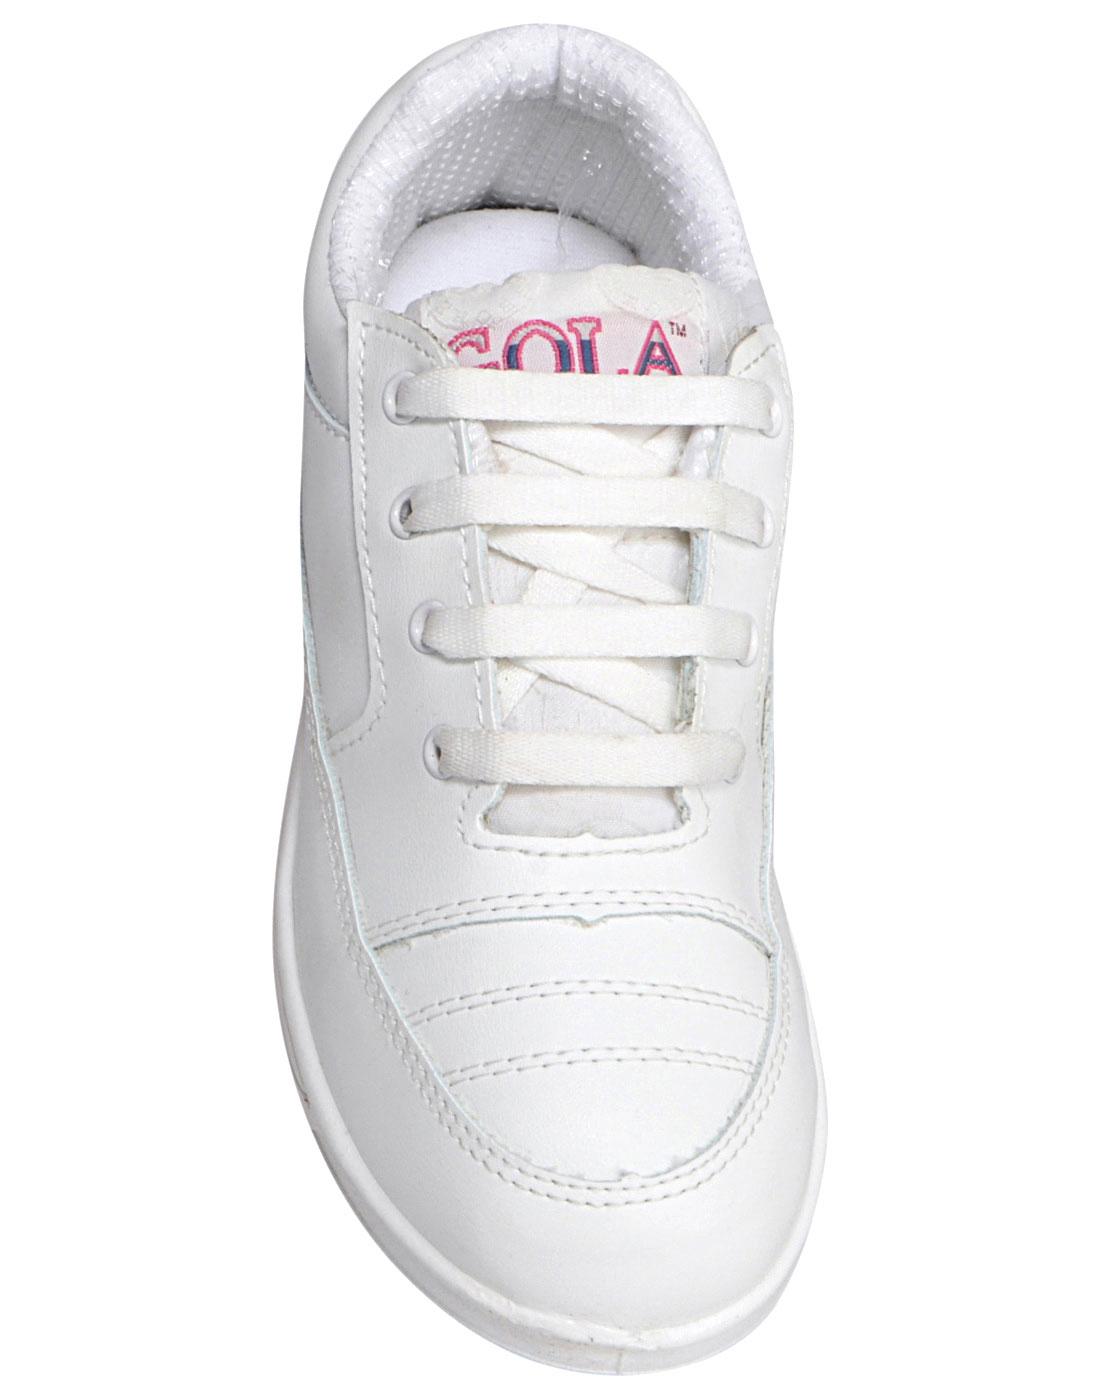 rex gola black school shoes new